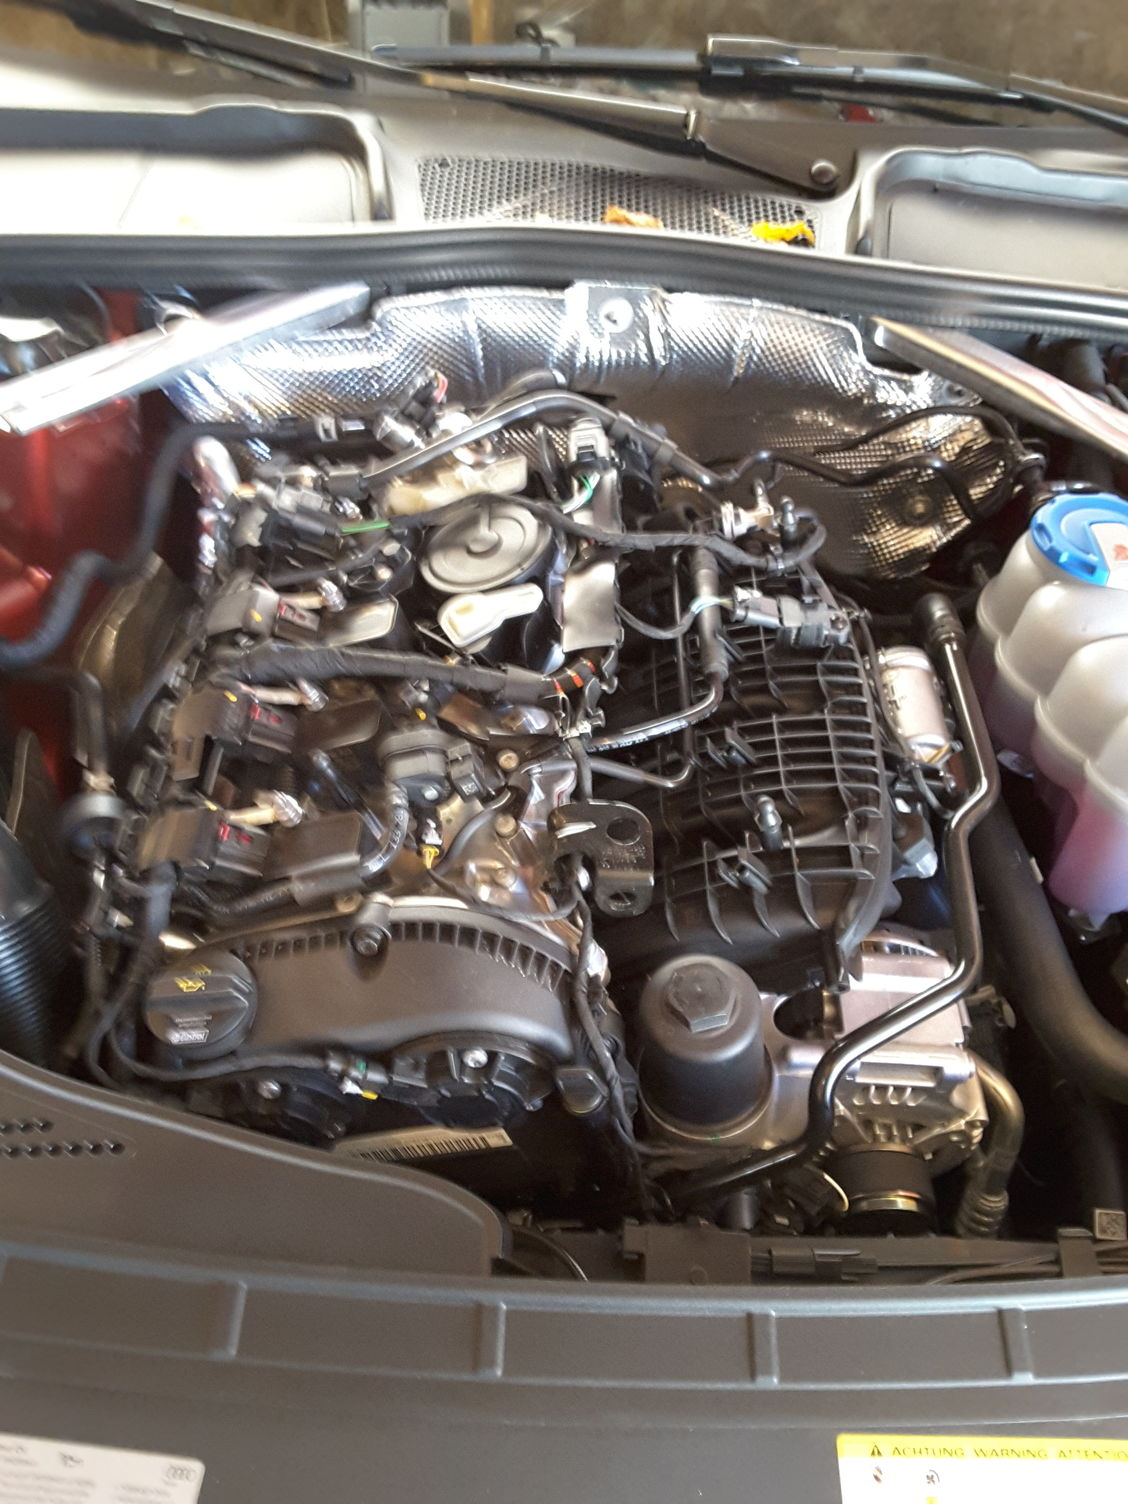 Audi R8 Oil Cap to be Used for VW and Audi 20T or 25 engines